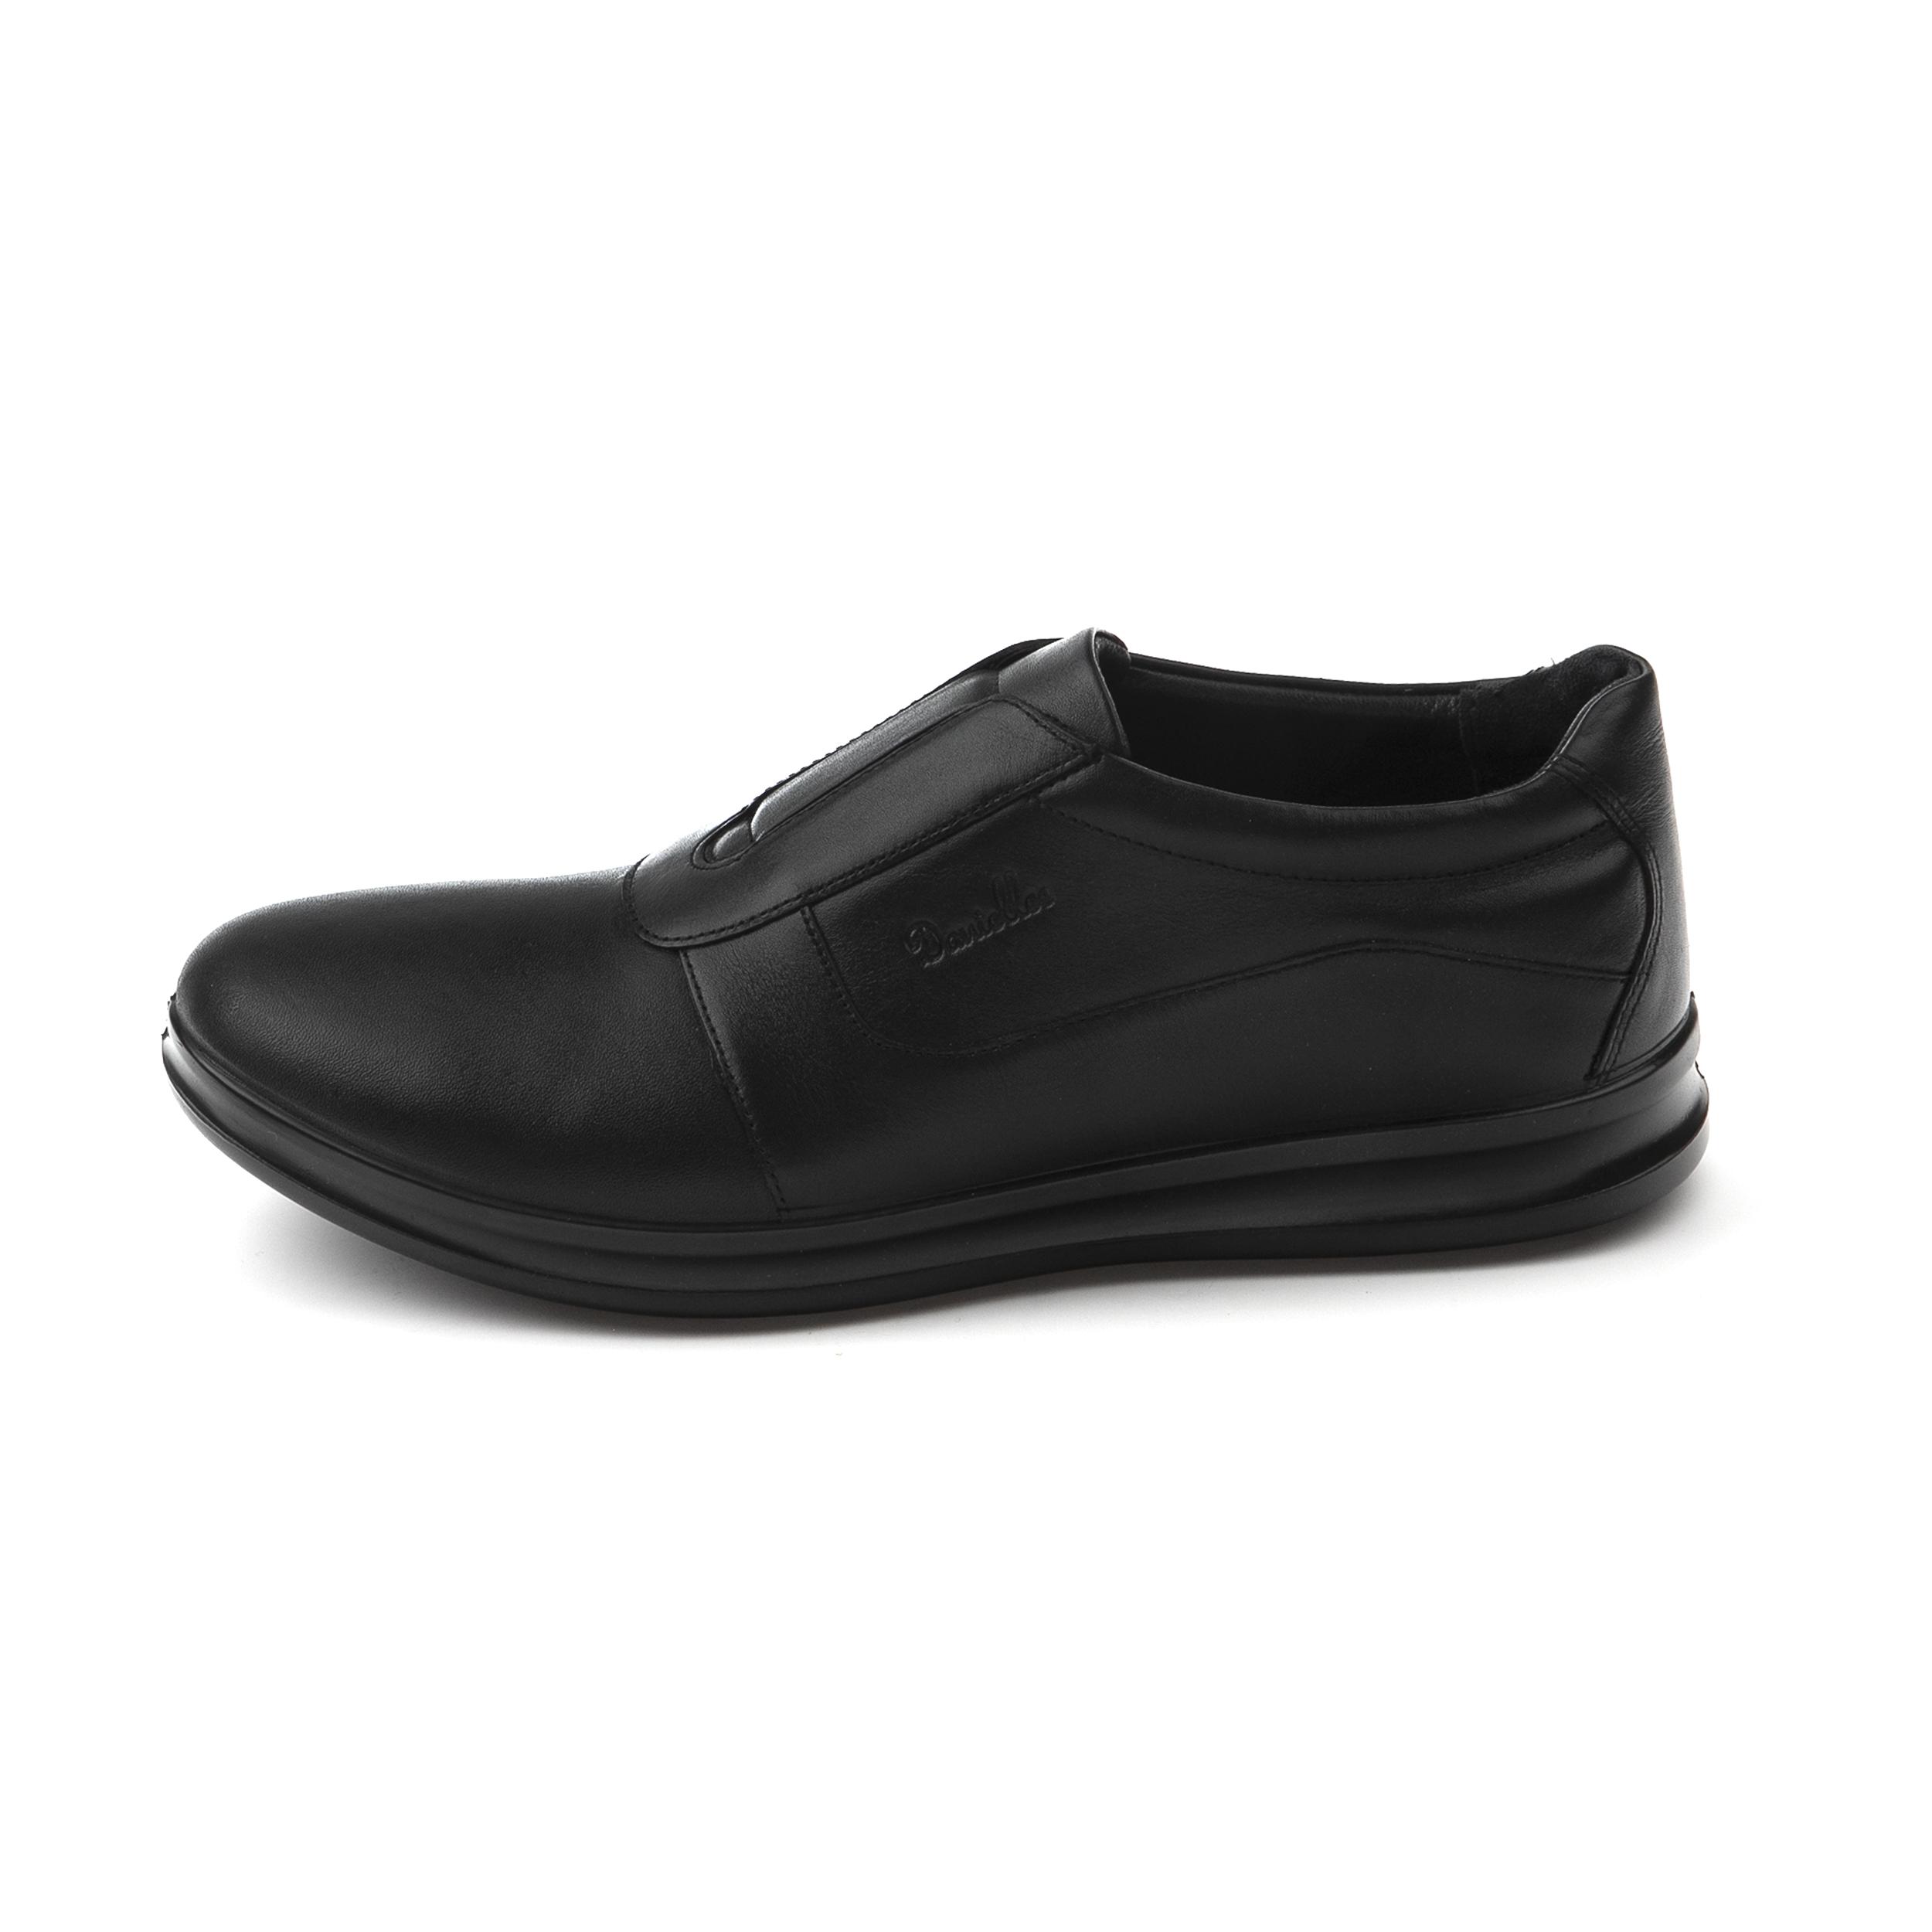 کفش روزمره مردانه دنیلی مدل Artman-213110461001